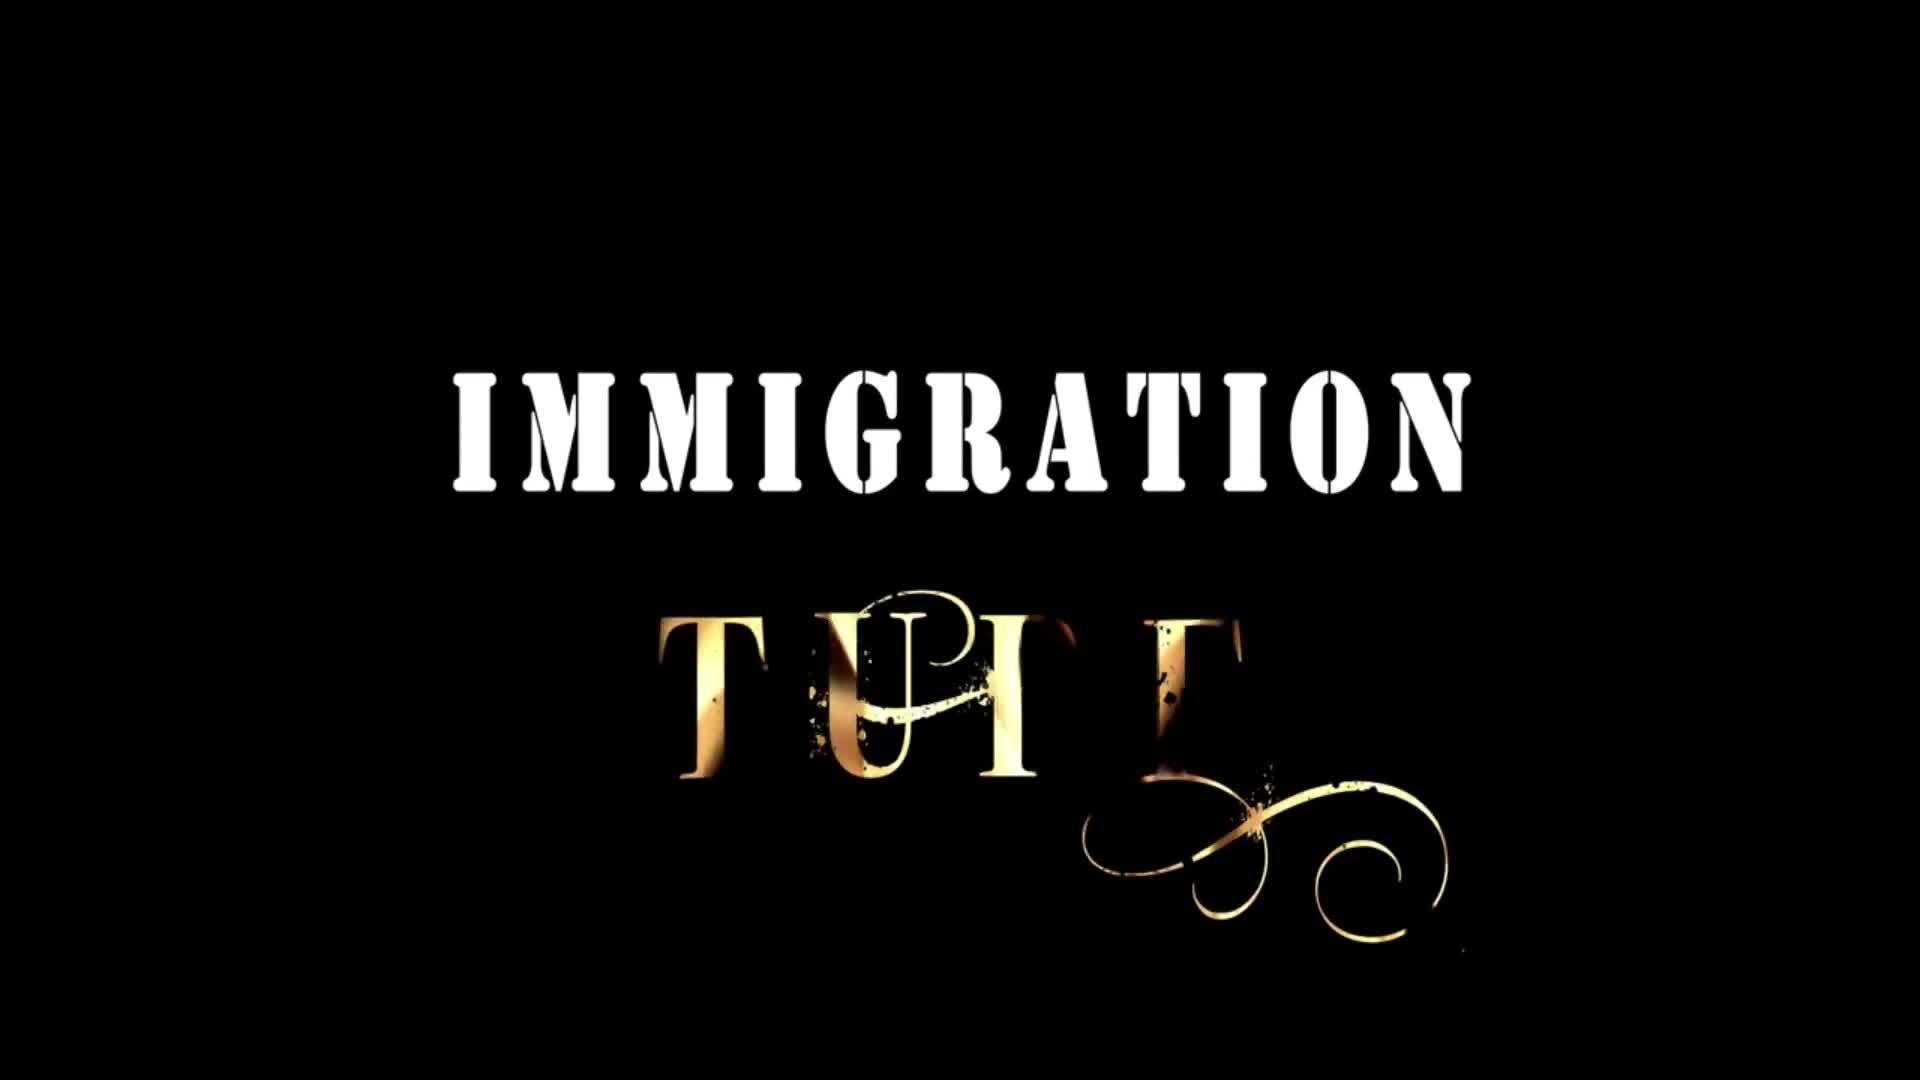 Immigration Turf